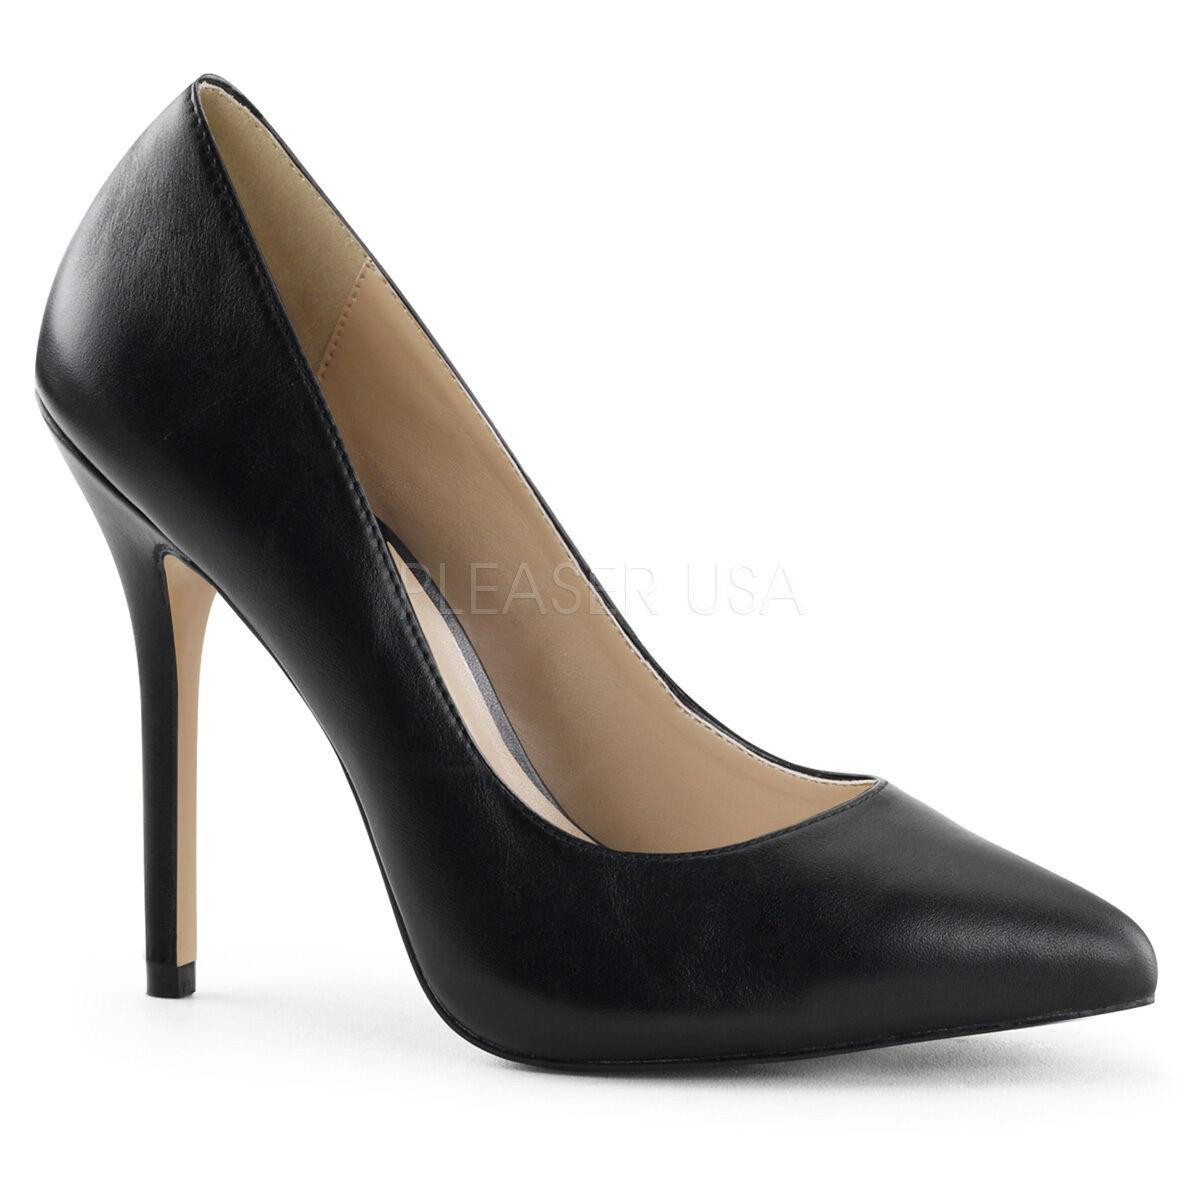 PLEASER - Schuhe Amuse-20 Eternal Classic Court Schuhe - Seductive Foot Arch 497c2e